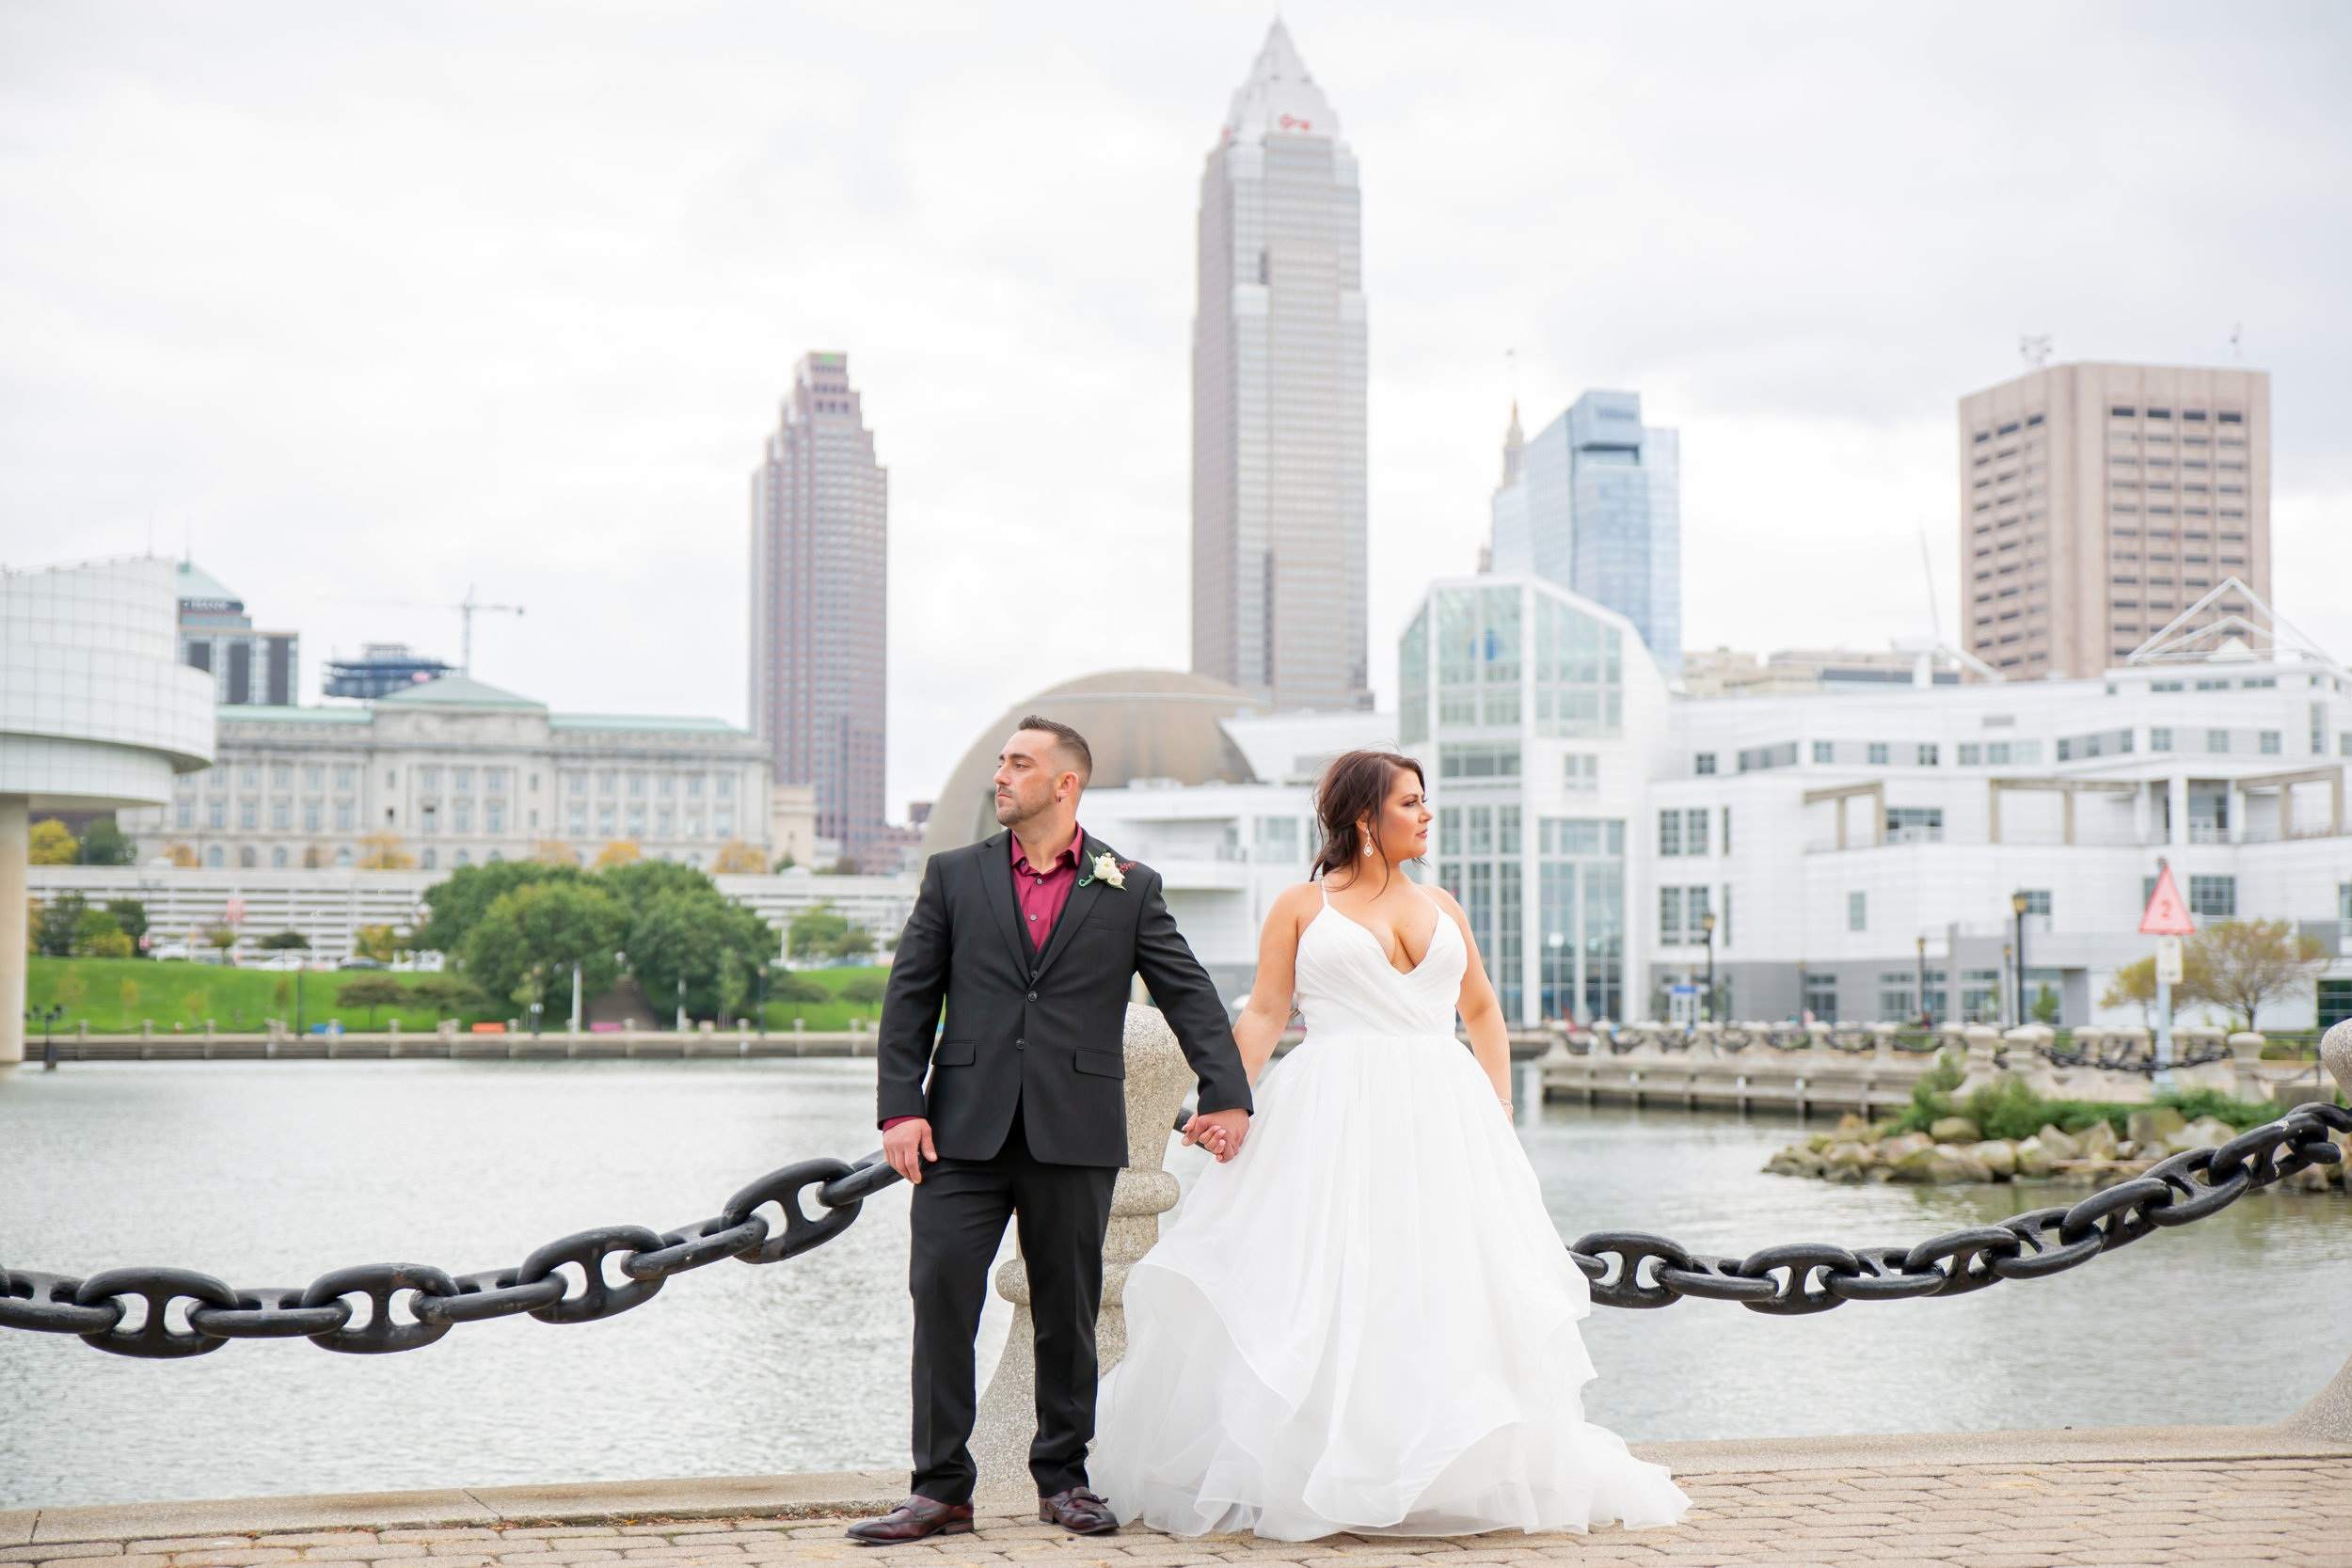 Hannah Cessna Photography - Wedding Photographer Cleveland Ohio wedding photo Voinovich park